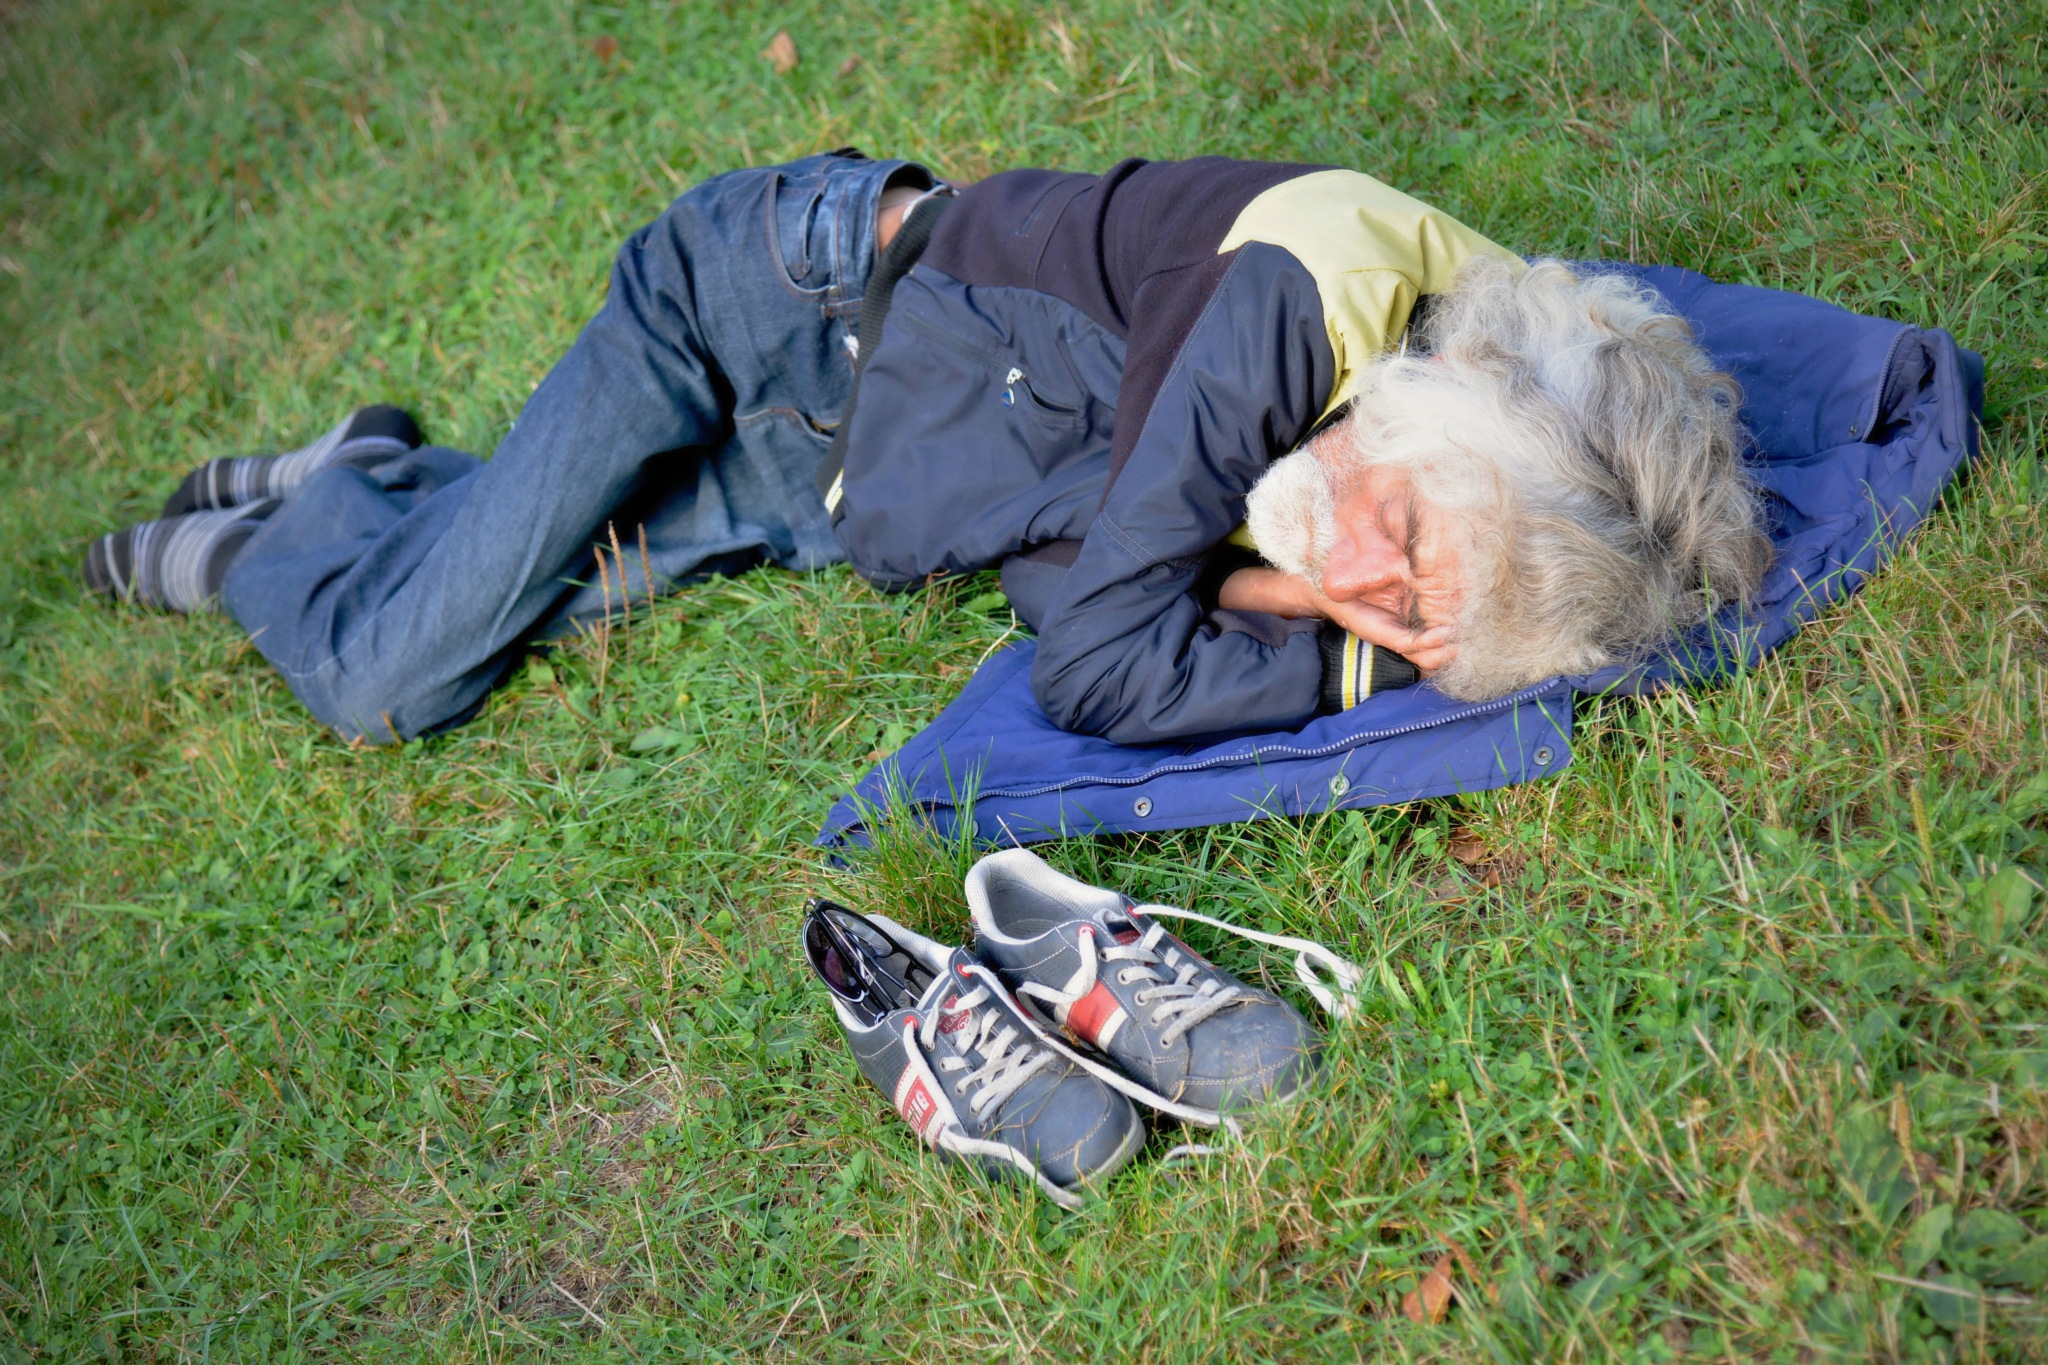 An afternoon siesta in park. by marcel cintalan